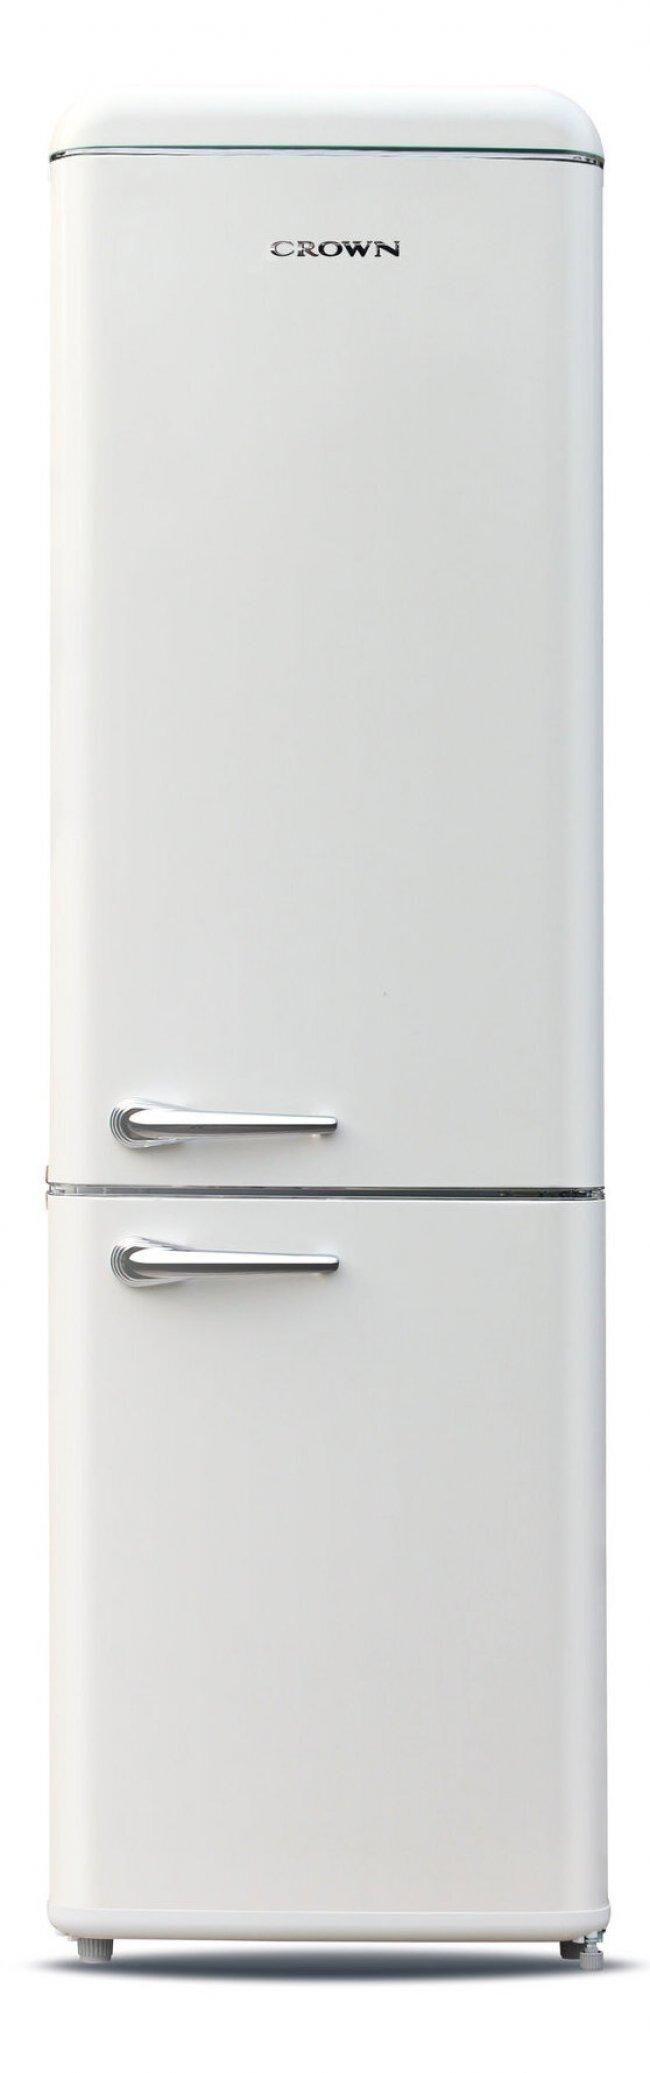 Хладилник Crown CBR-260VAN